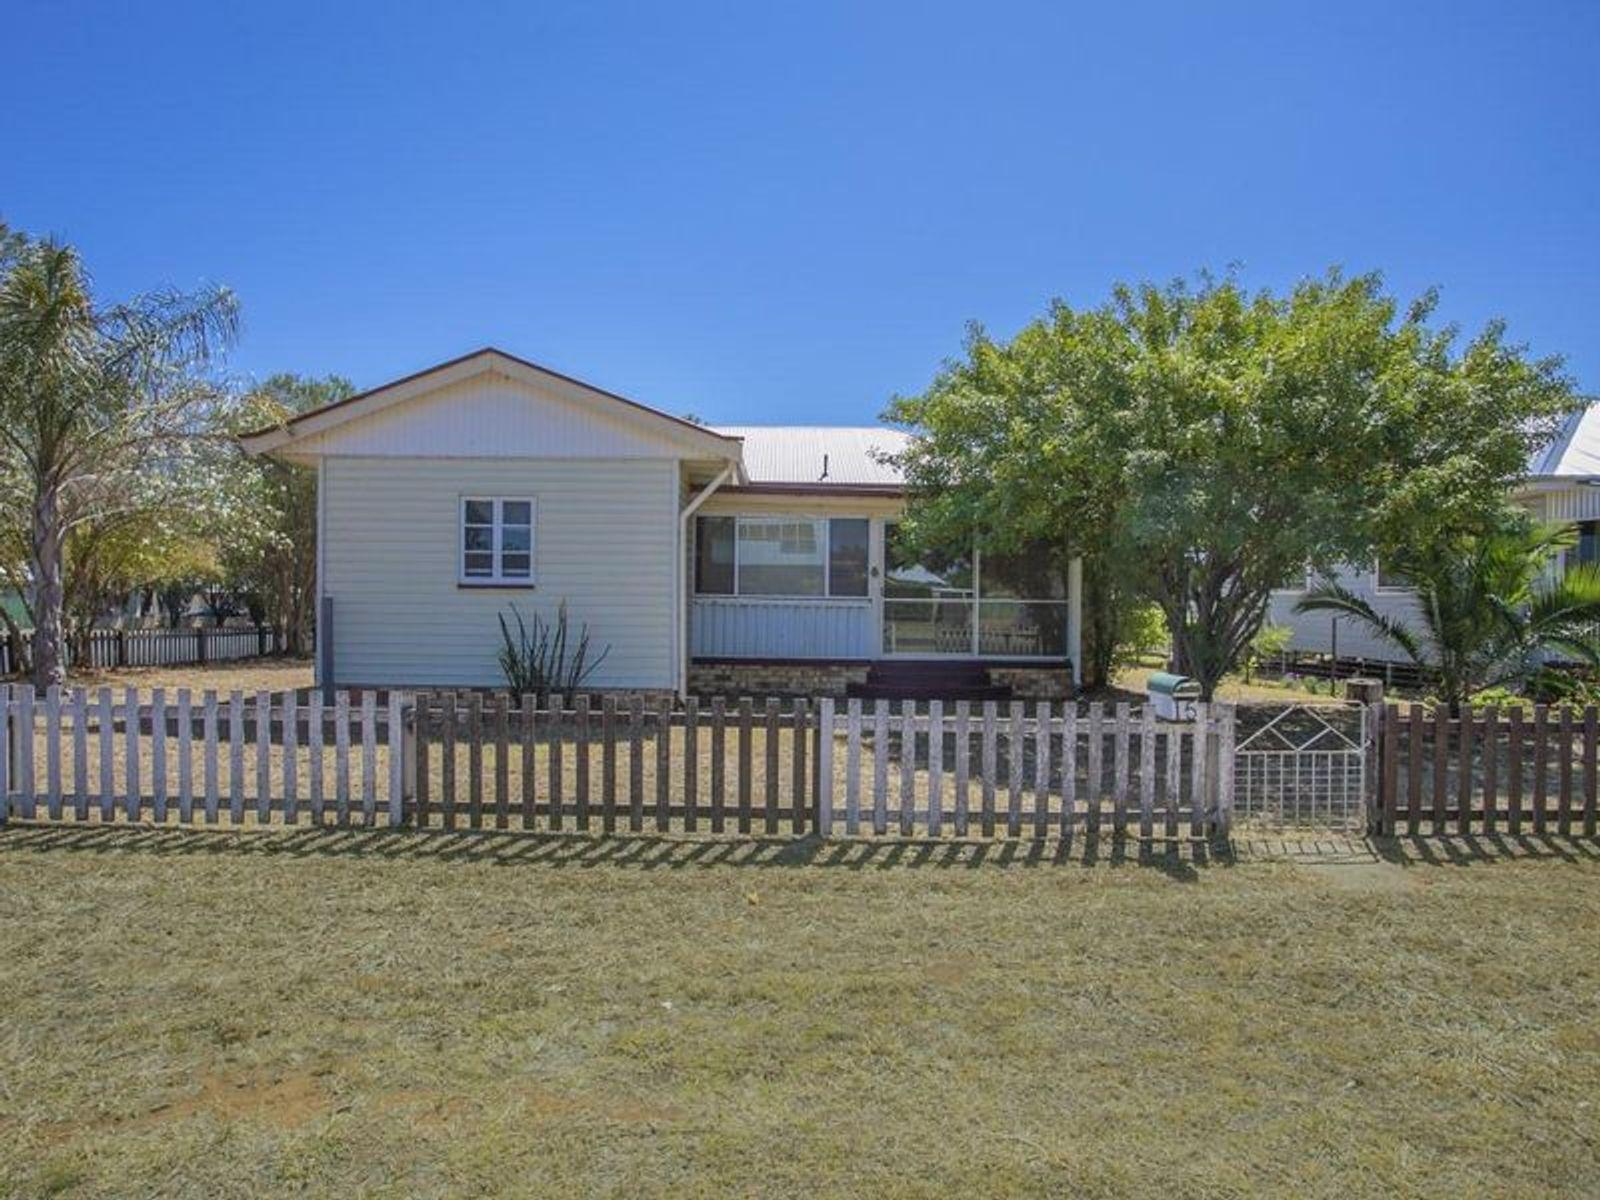 15 Russell Street, Chinchilla, QLD 4413